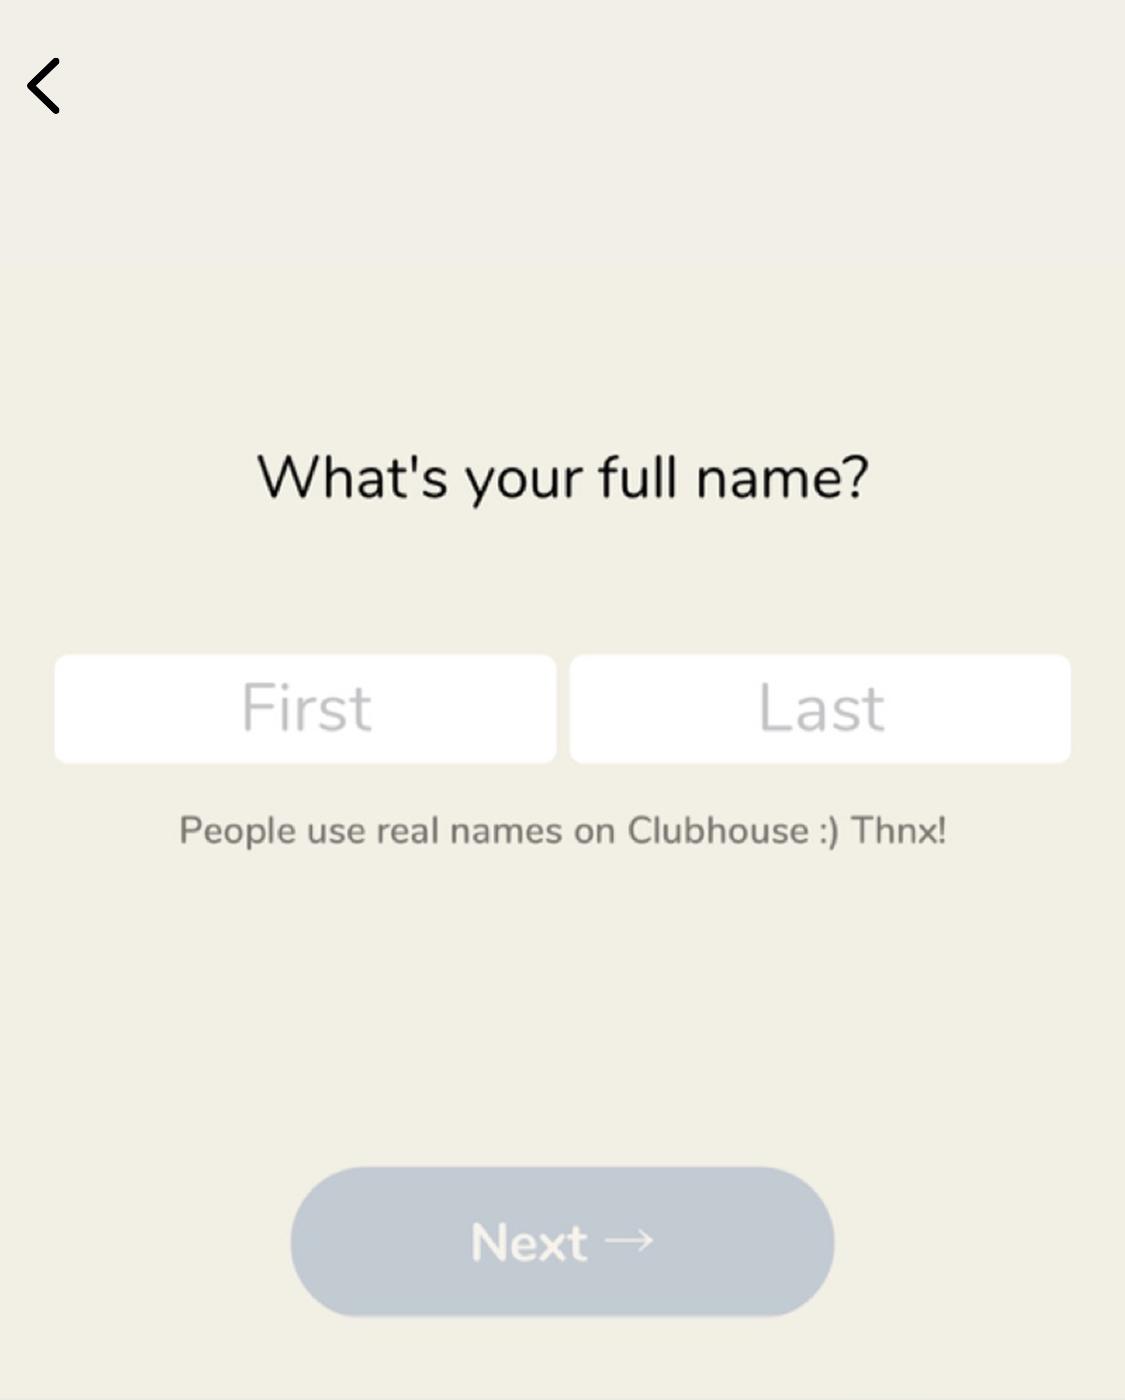 Clubhouseで表示される名前を登録する画面です